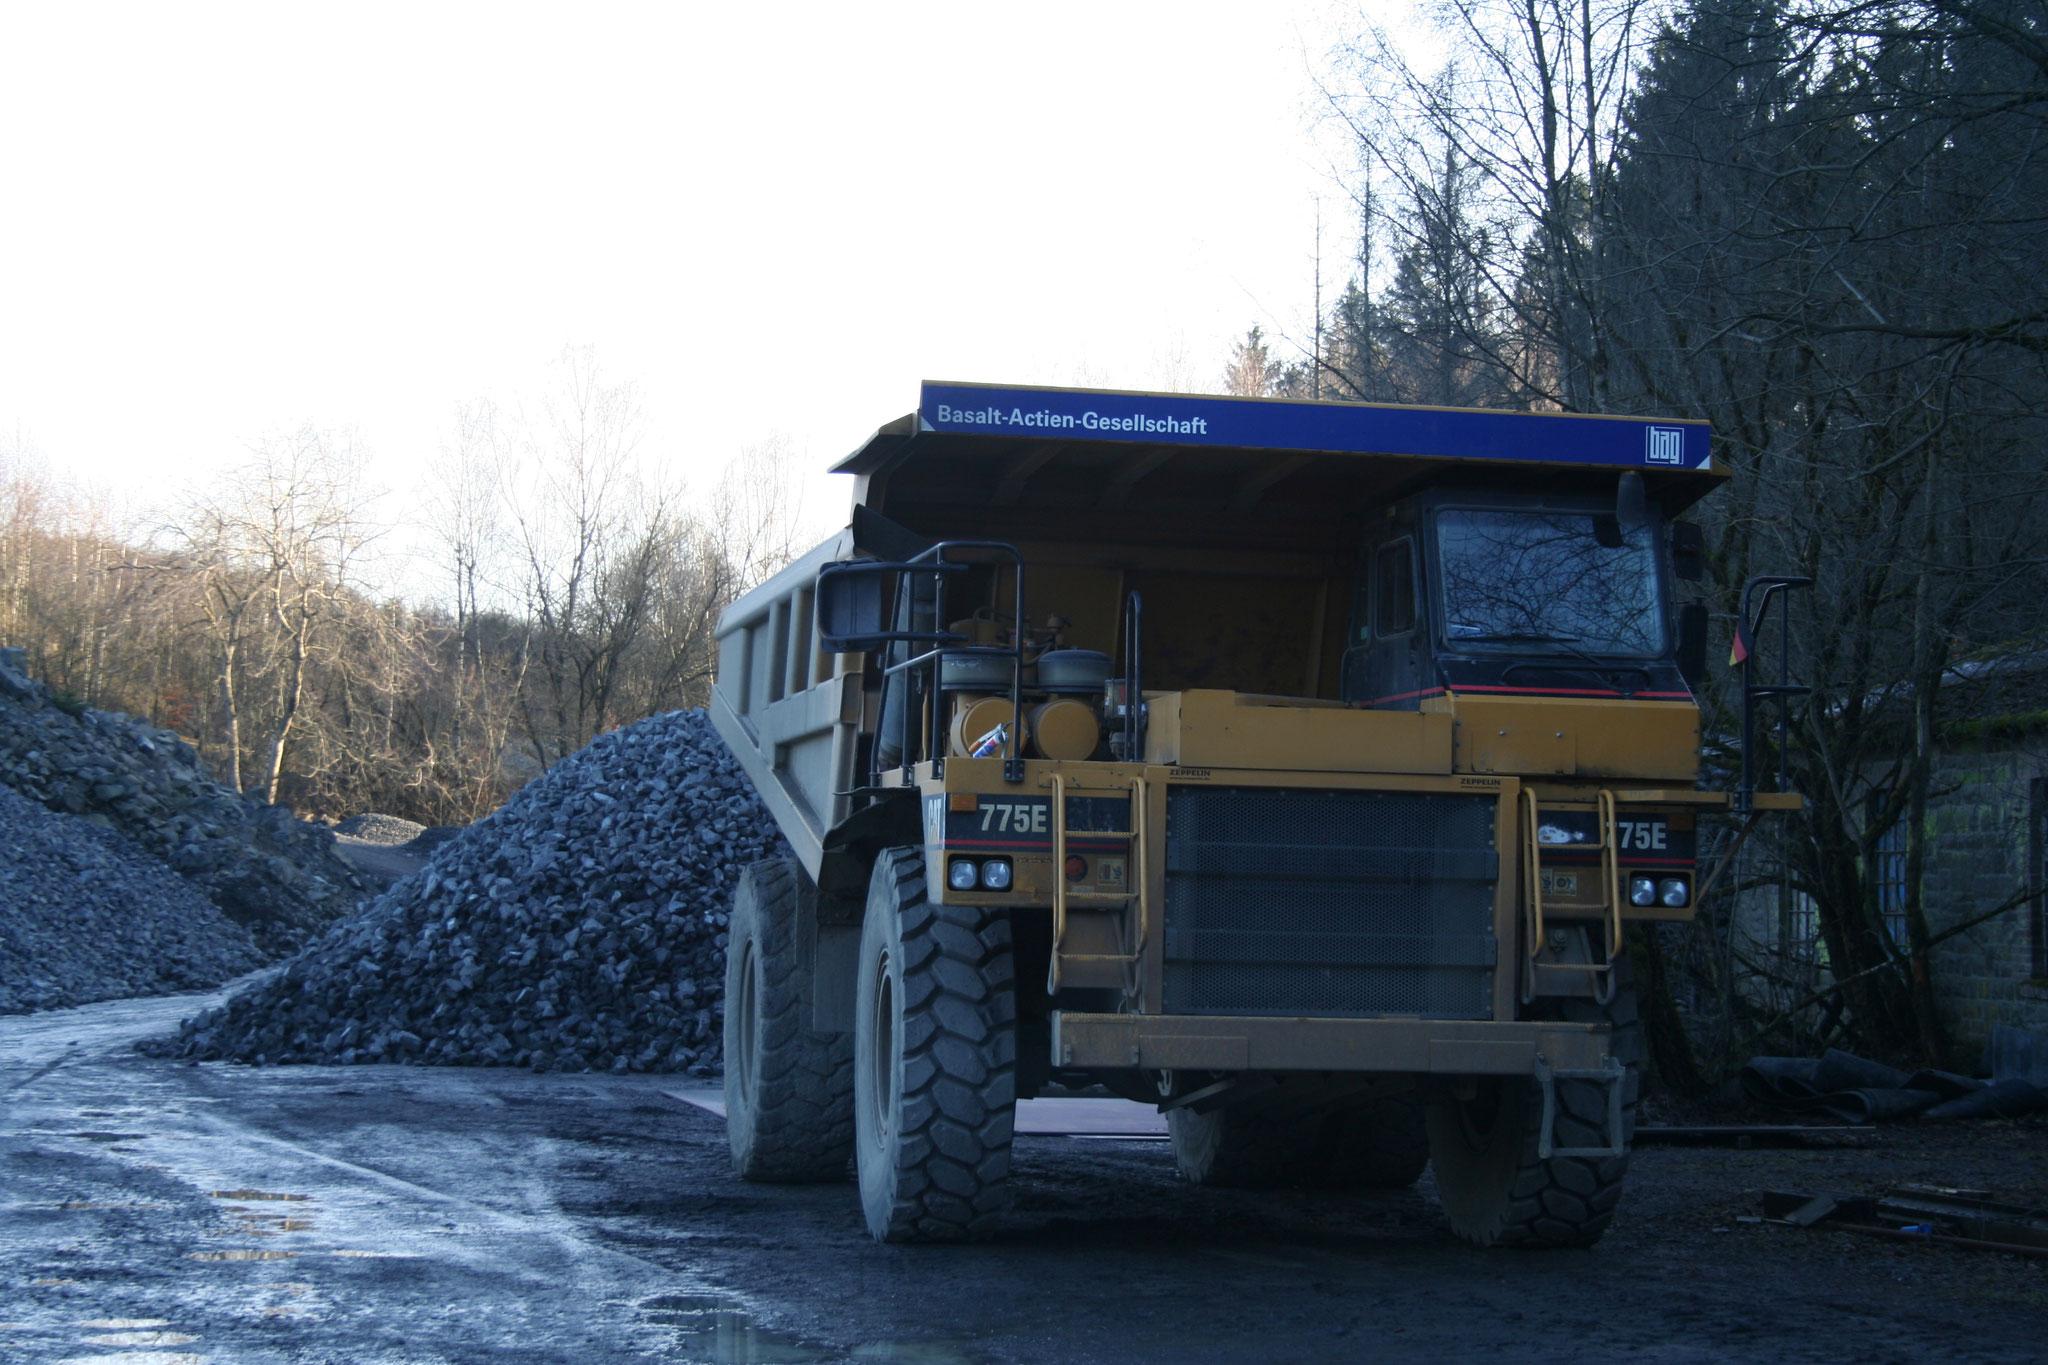 Steinbruch Stockum - Muldenkipper zum Transport der Basaltbrocken